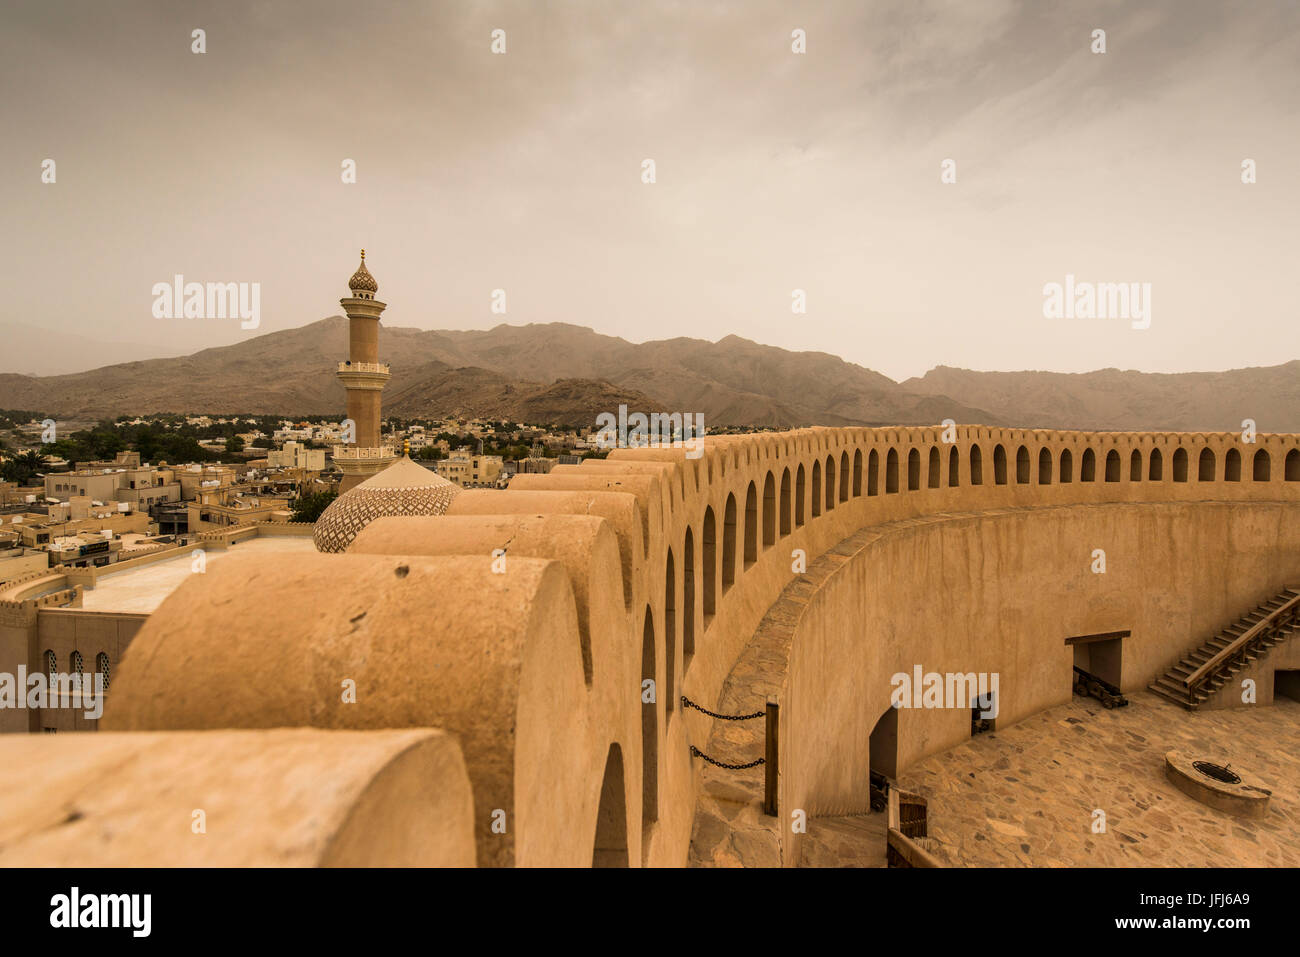 Arabia, Arabian peninsula, Sultanate of Oman, Nizwa, fort - Stock Image